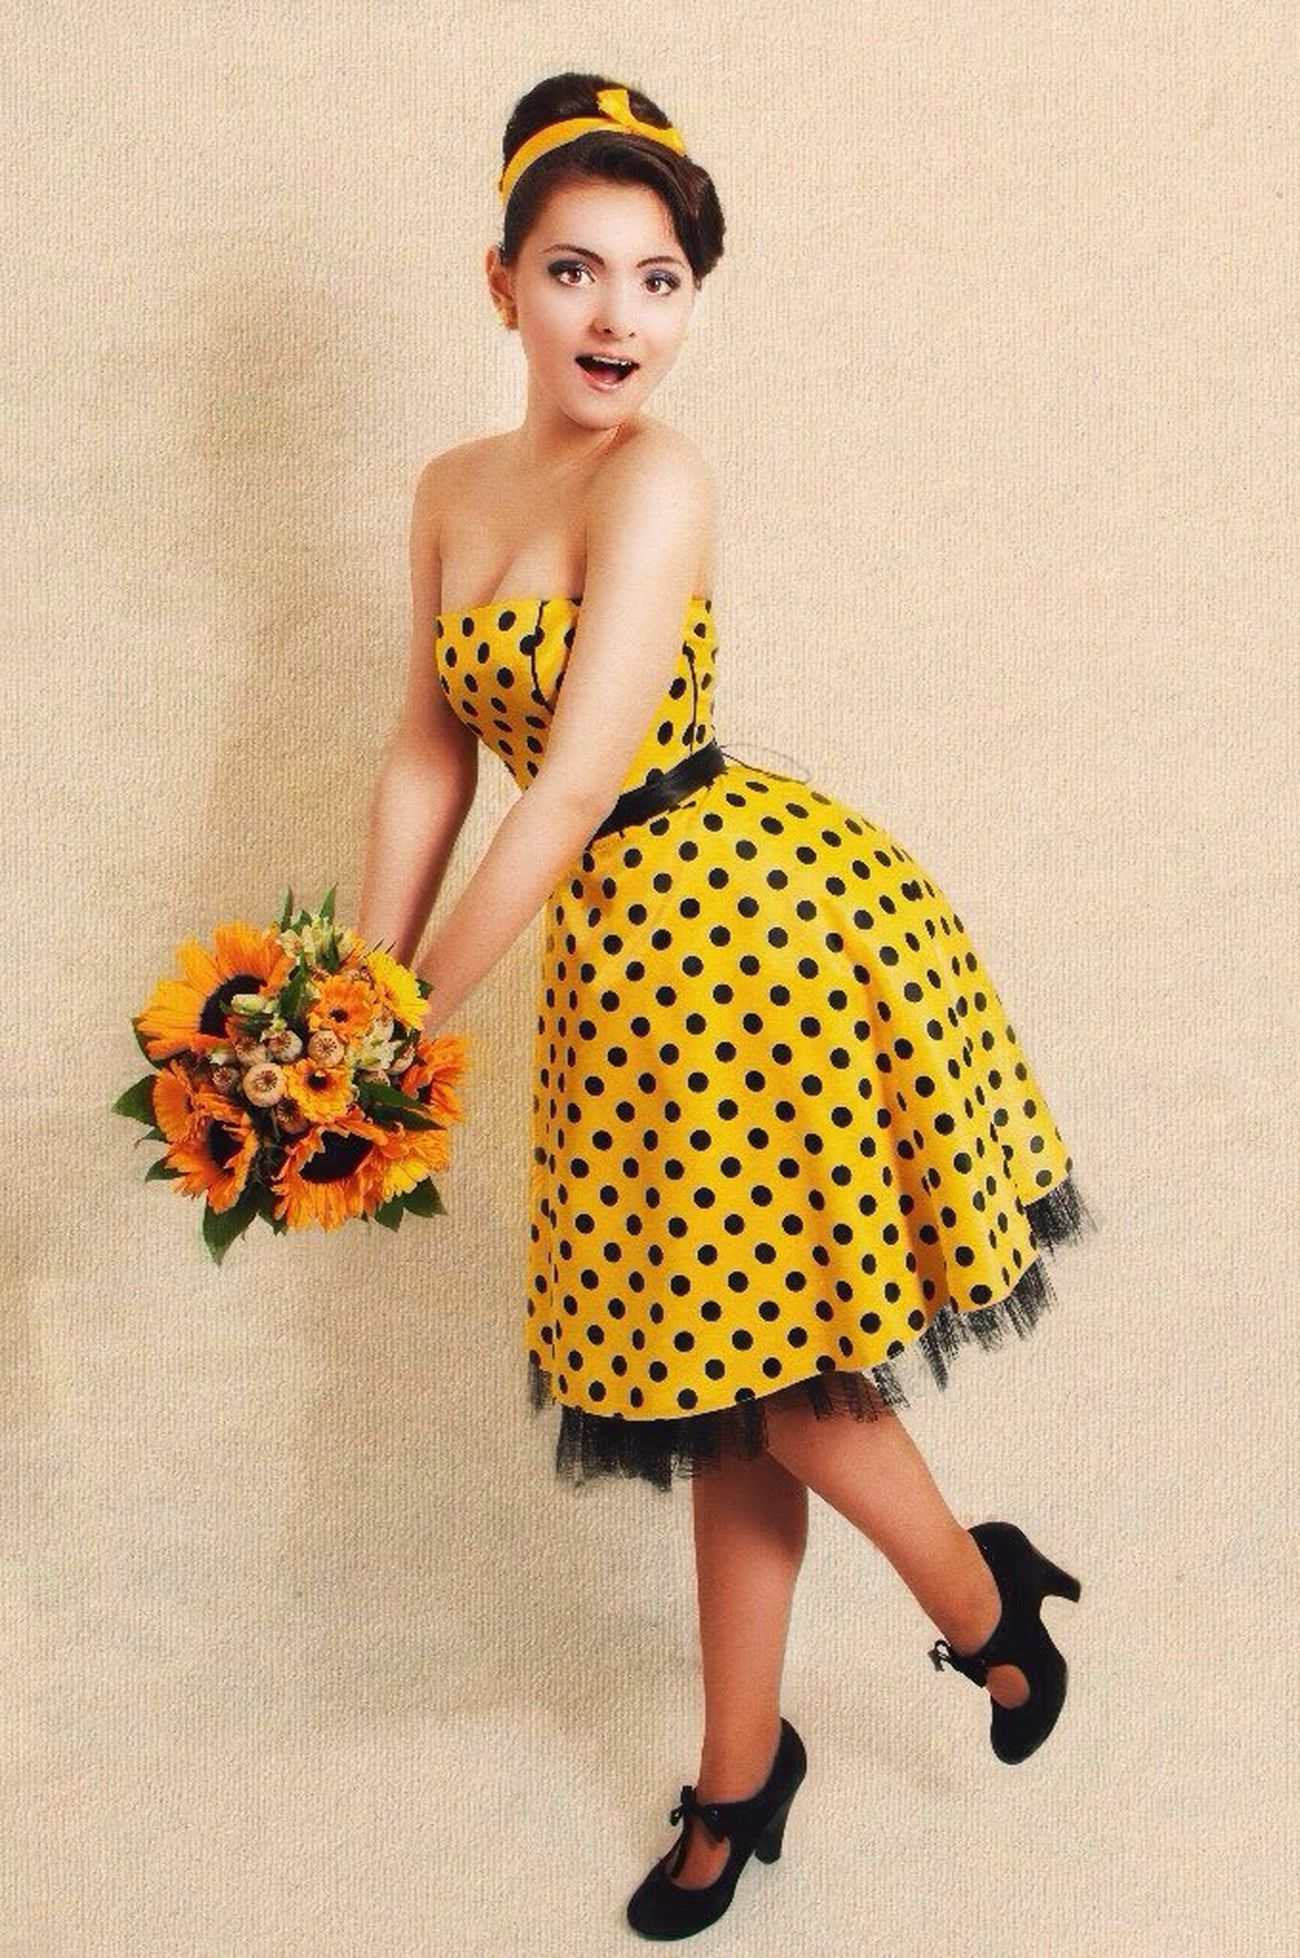 Fotomodel Flower Flowers In My Garden Poster Vintage Pin Up Girl Foto Makeup